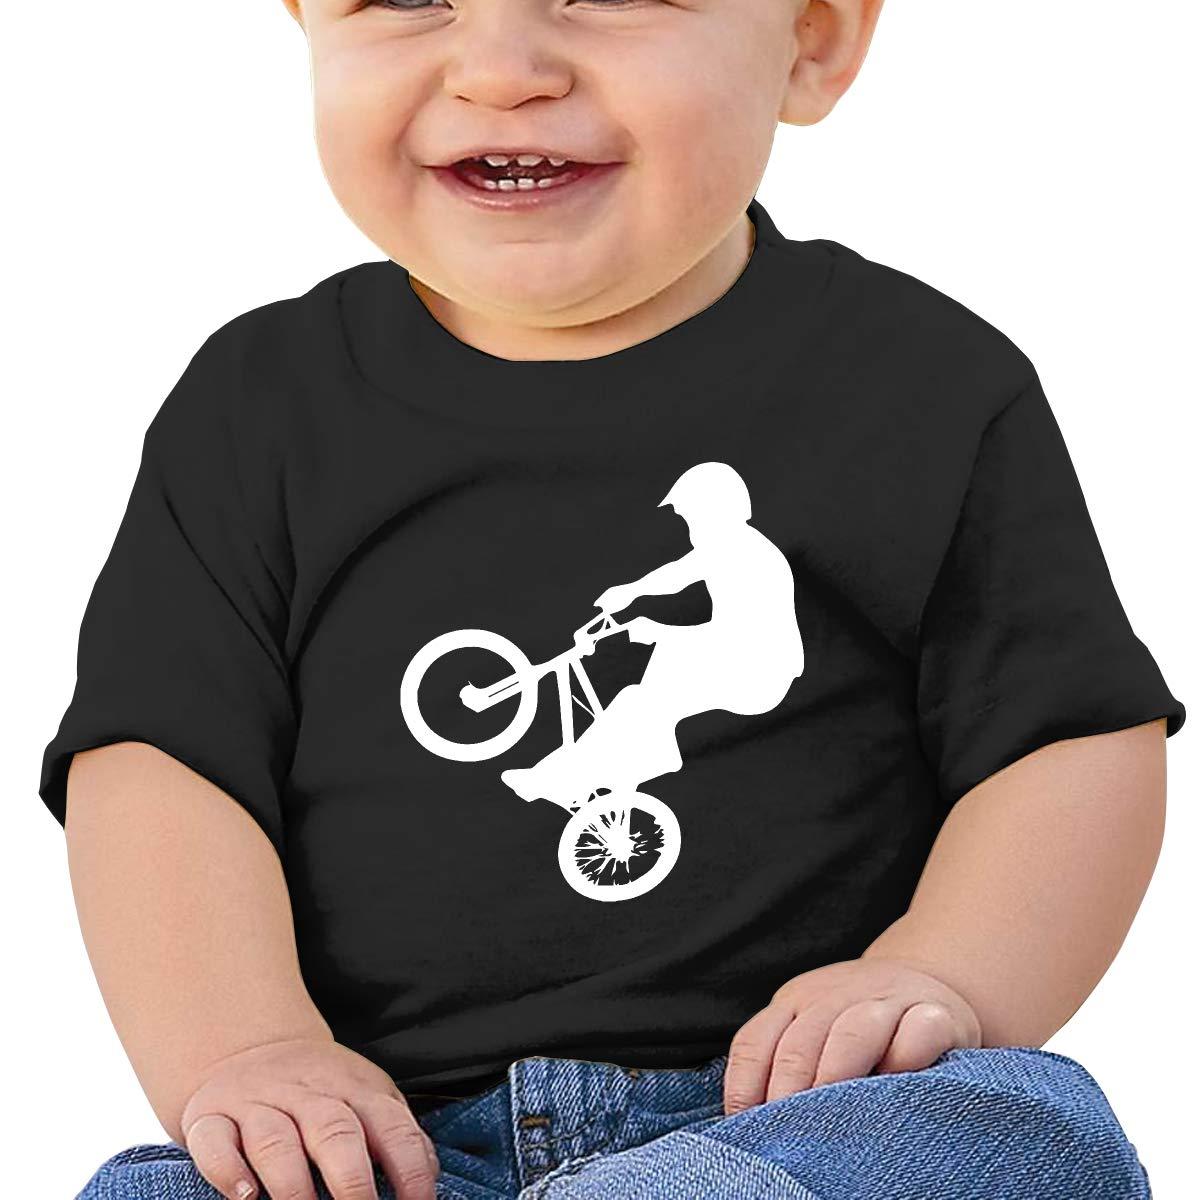 BMX Baby Boys Girls Short Sleeve Crewneck T-Shirt 6-18 Month Tops